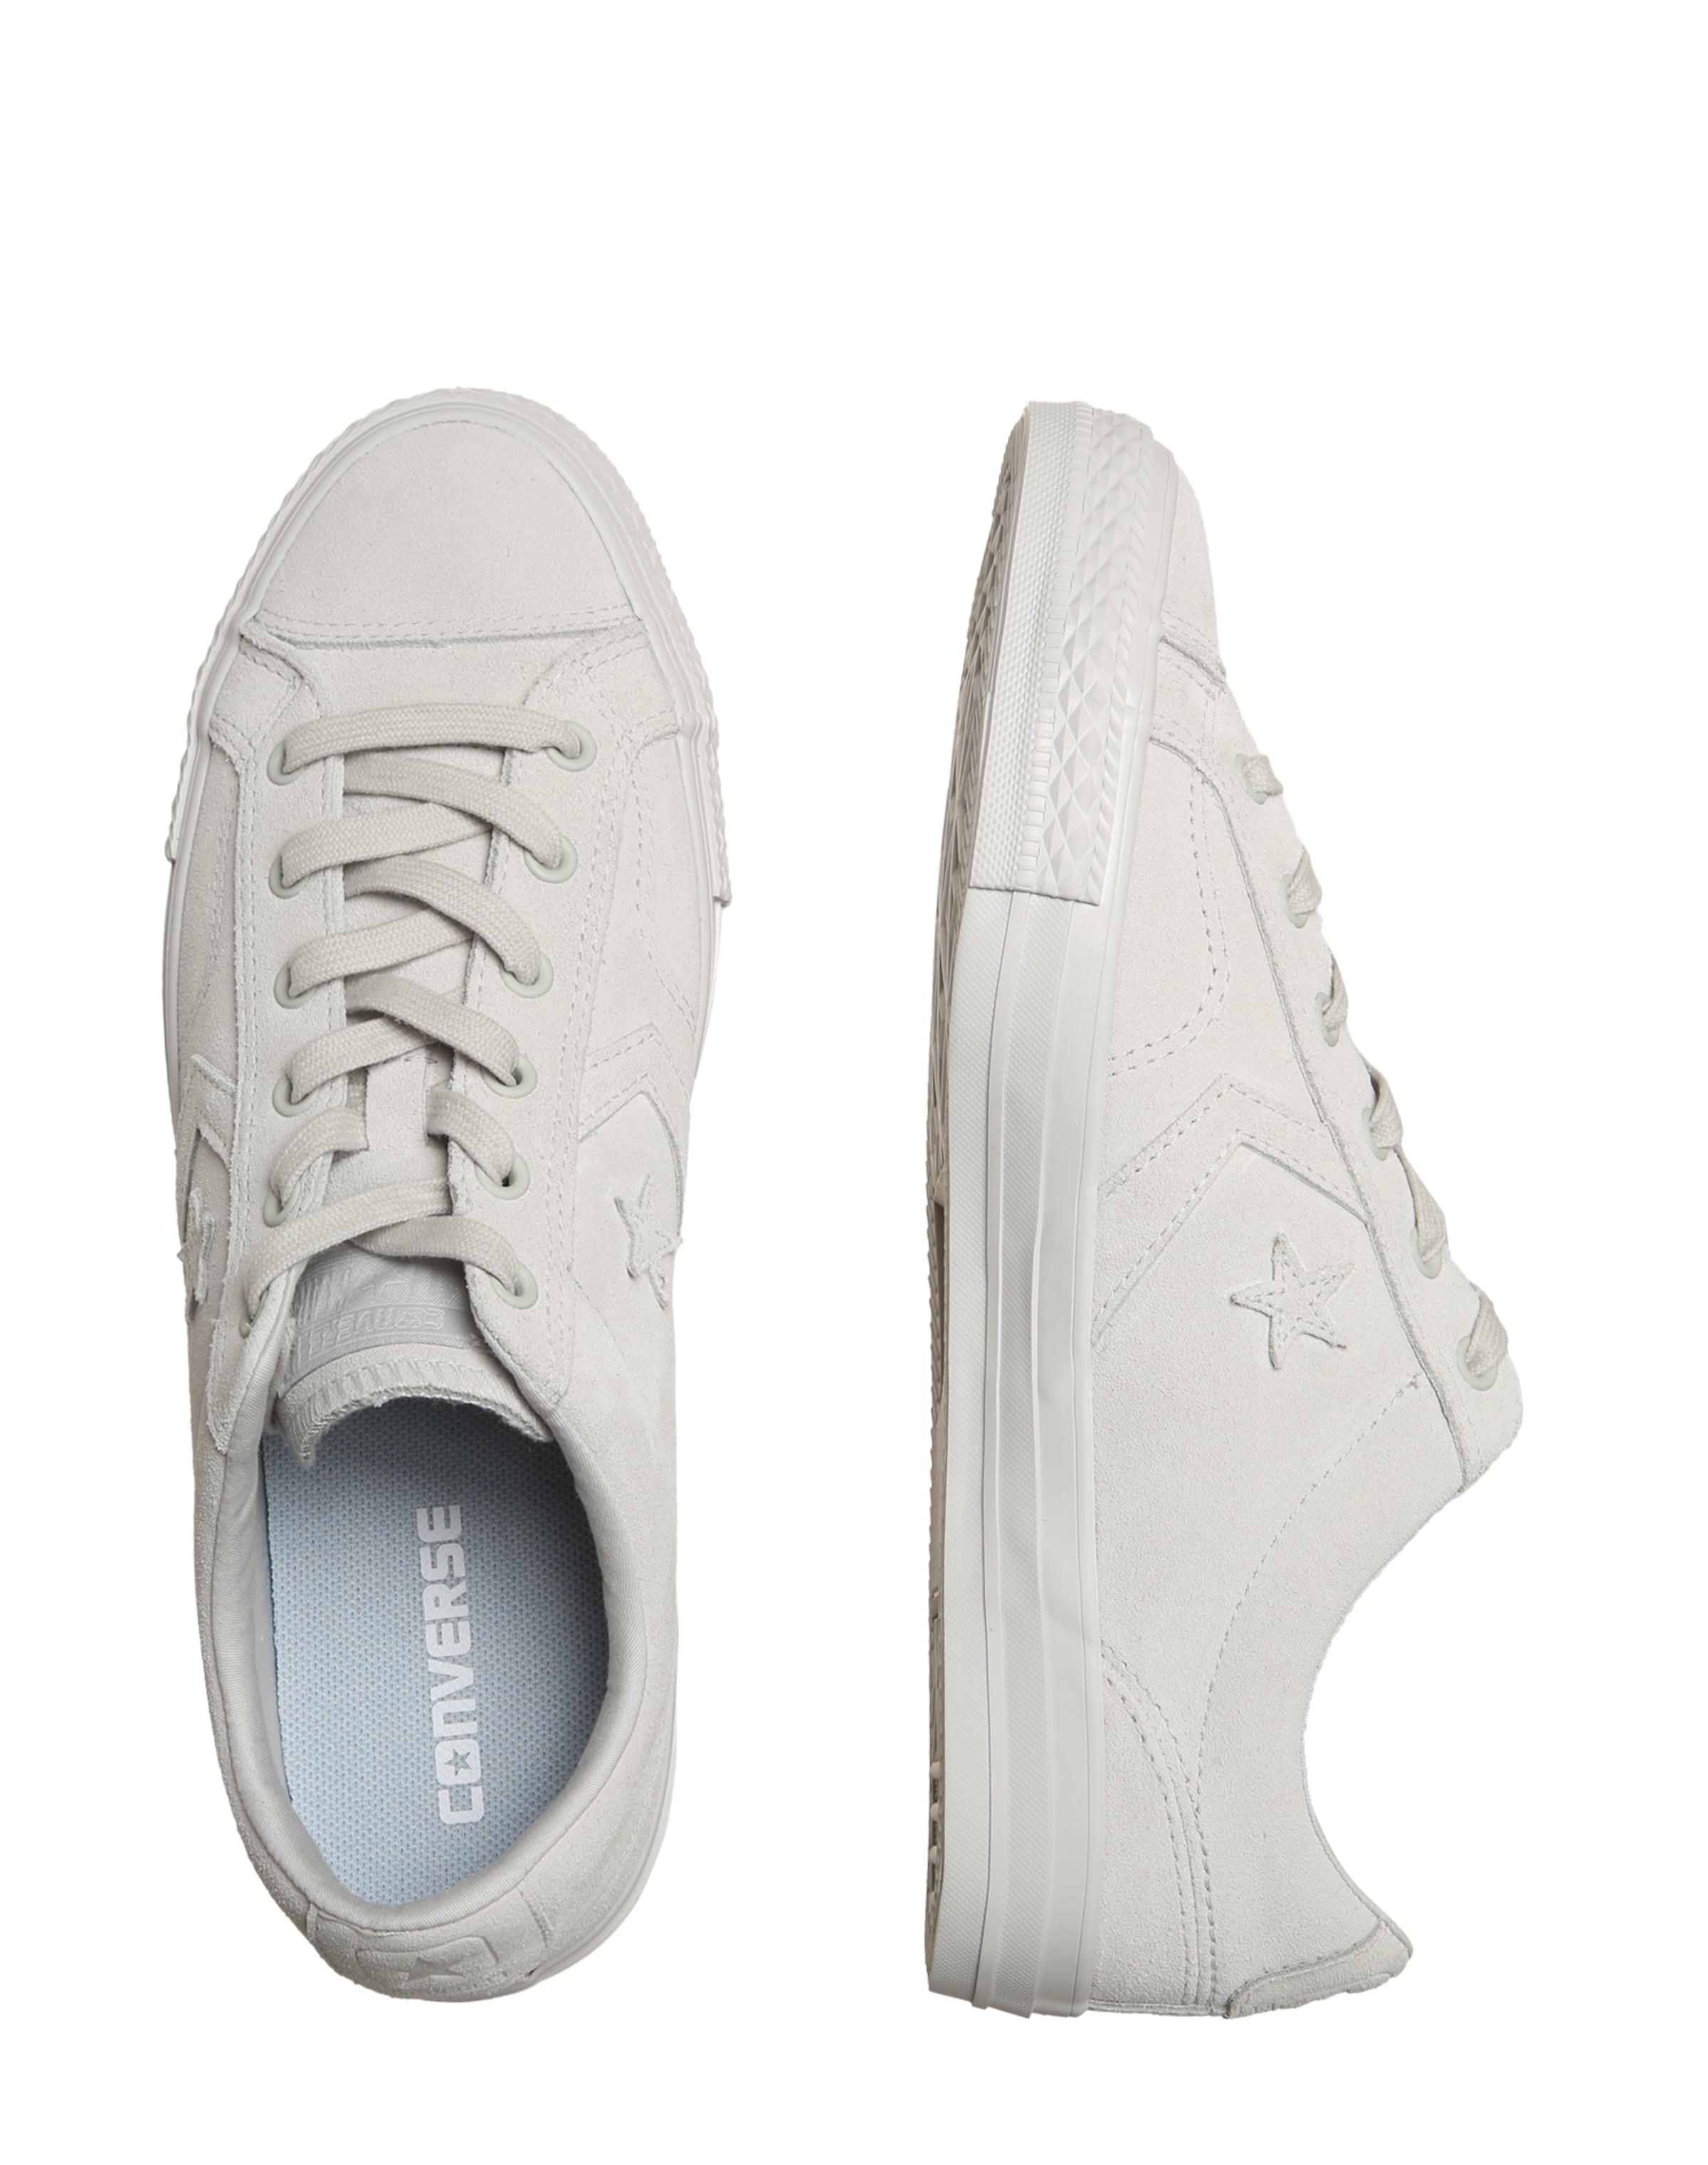 Offwhite In Sneaker Ox' Converse 'star Player CQrtshd